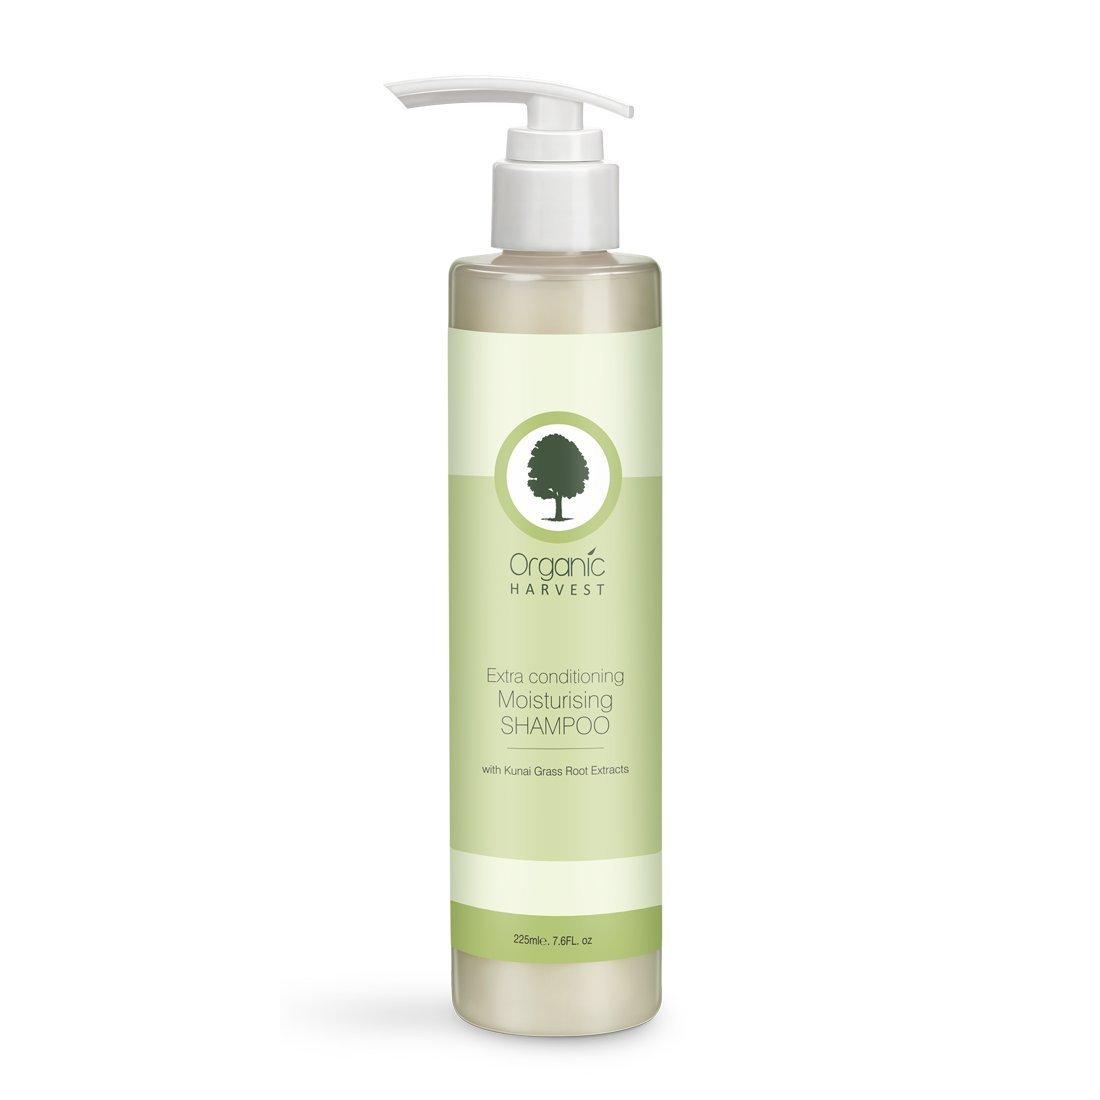 Organic Harvest Extra Conditioning Moisturising Shampoo Image